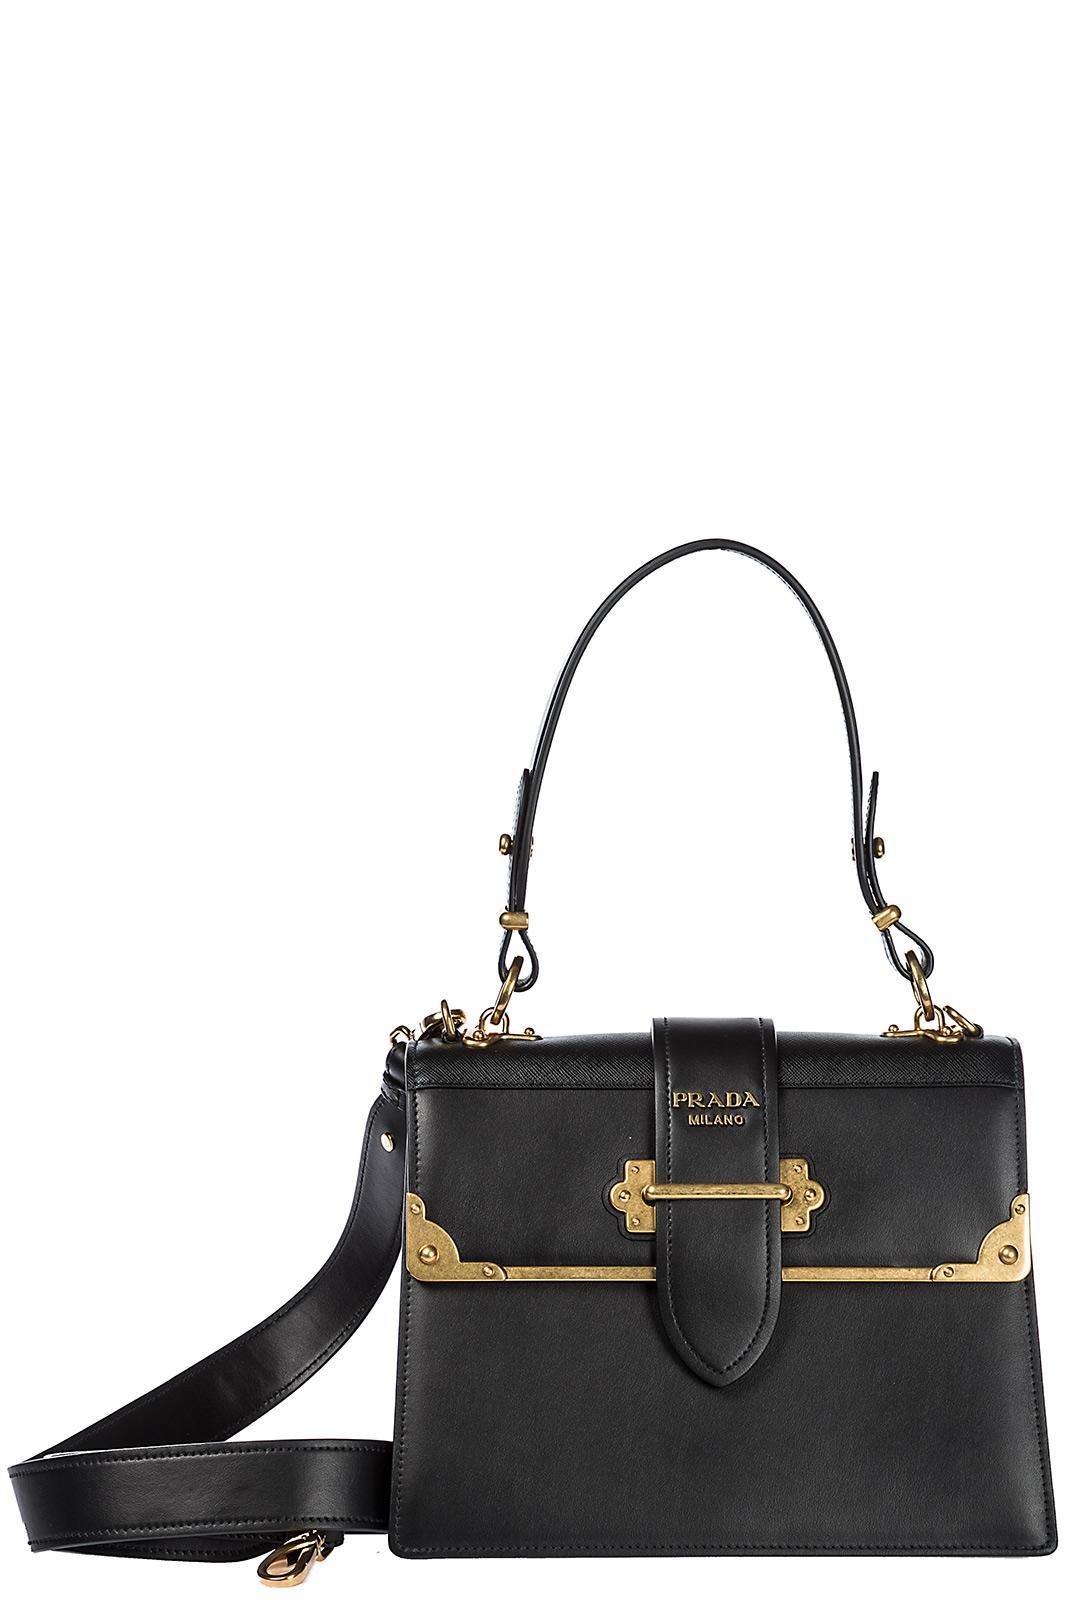 Prada Women's Leather Handbag Shopping Bag Purse In Black